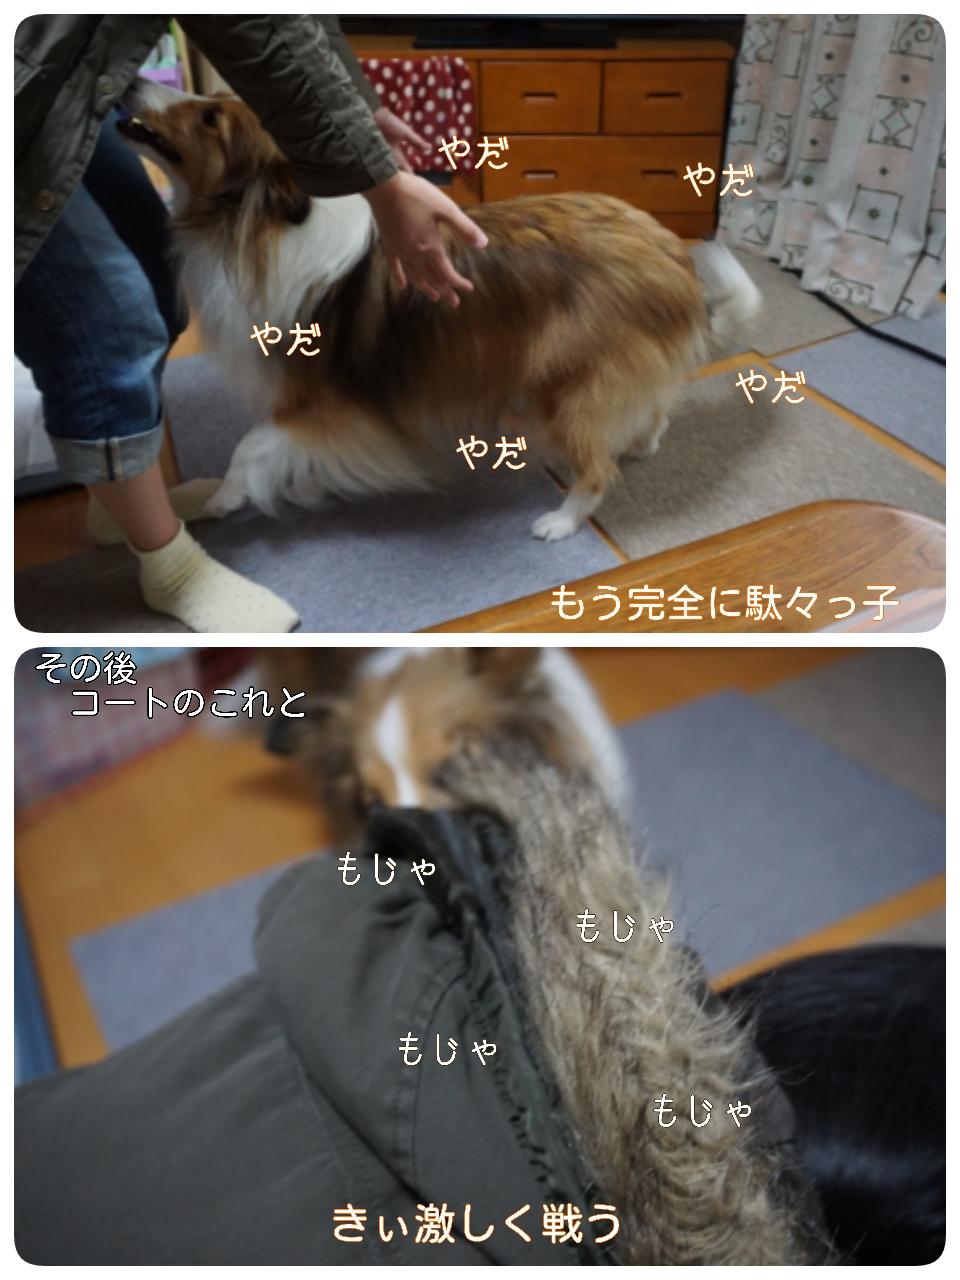 15-11-23-16-01-46-432_deco.jpg